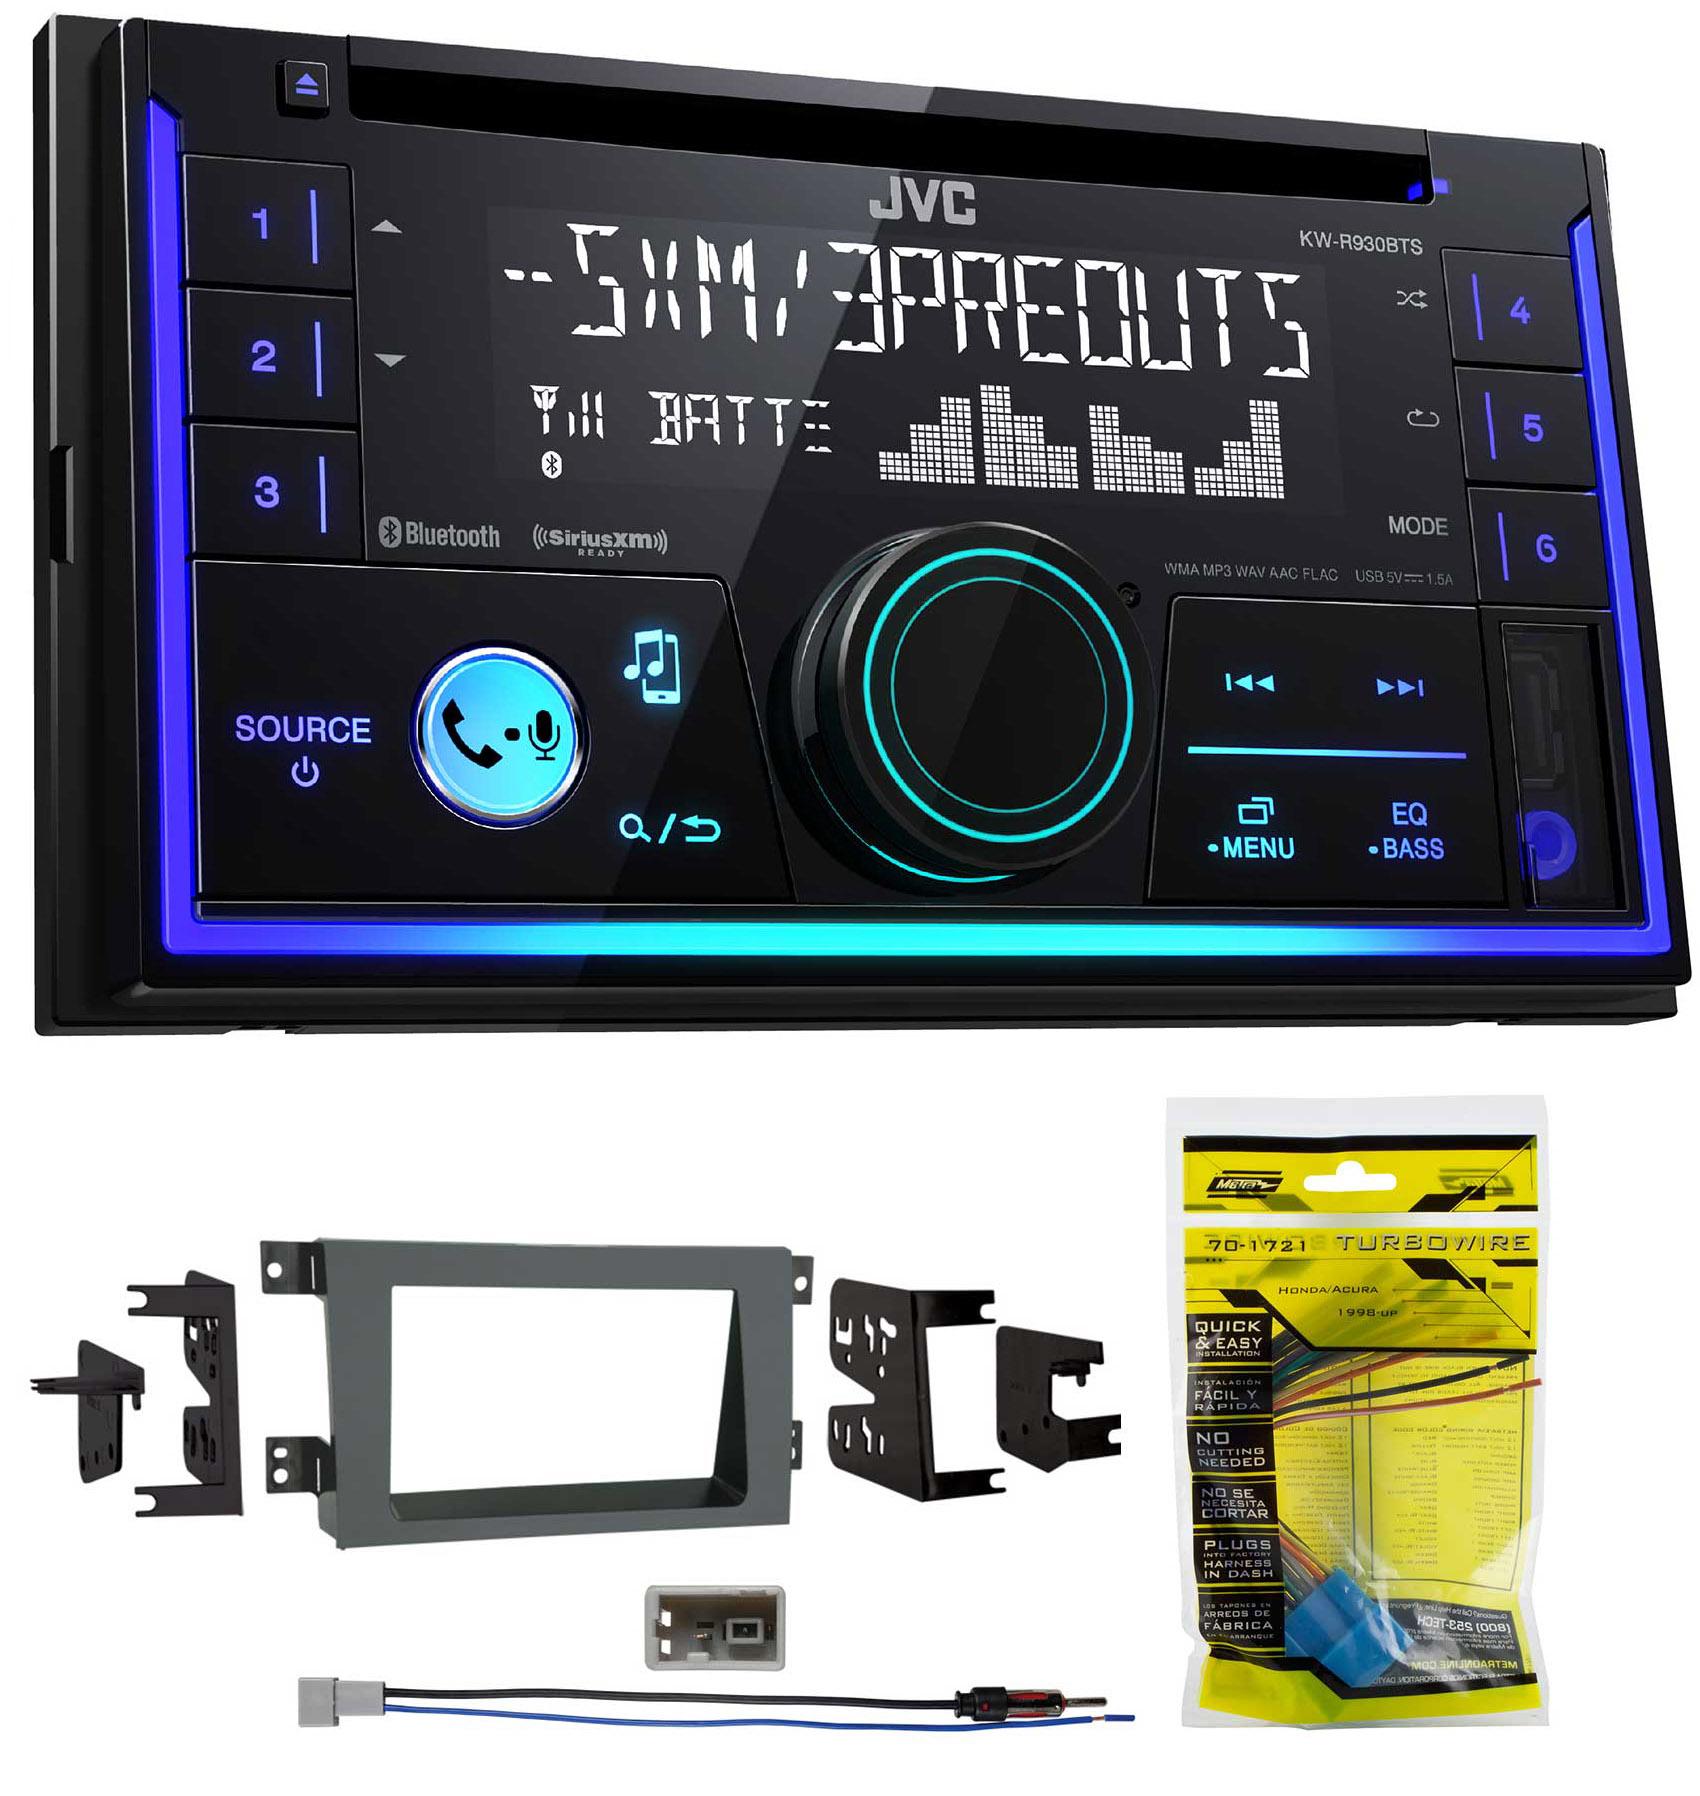 JVC Stereo CD Receiver w Bluetooth USB iPhone Sirius For 2005-08 Honda Ridgeline by JVC